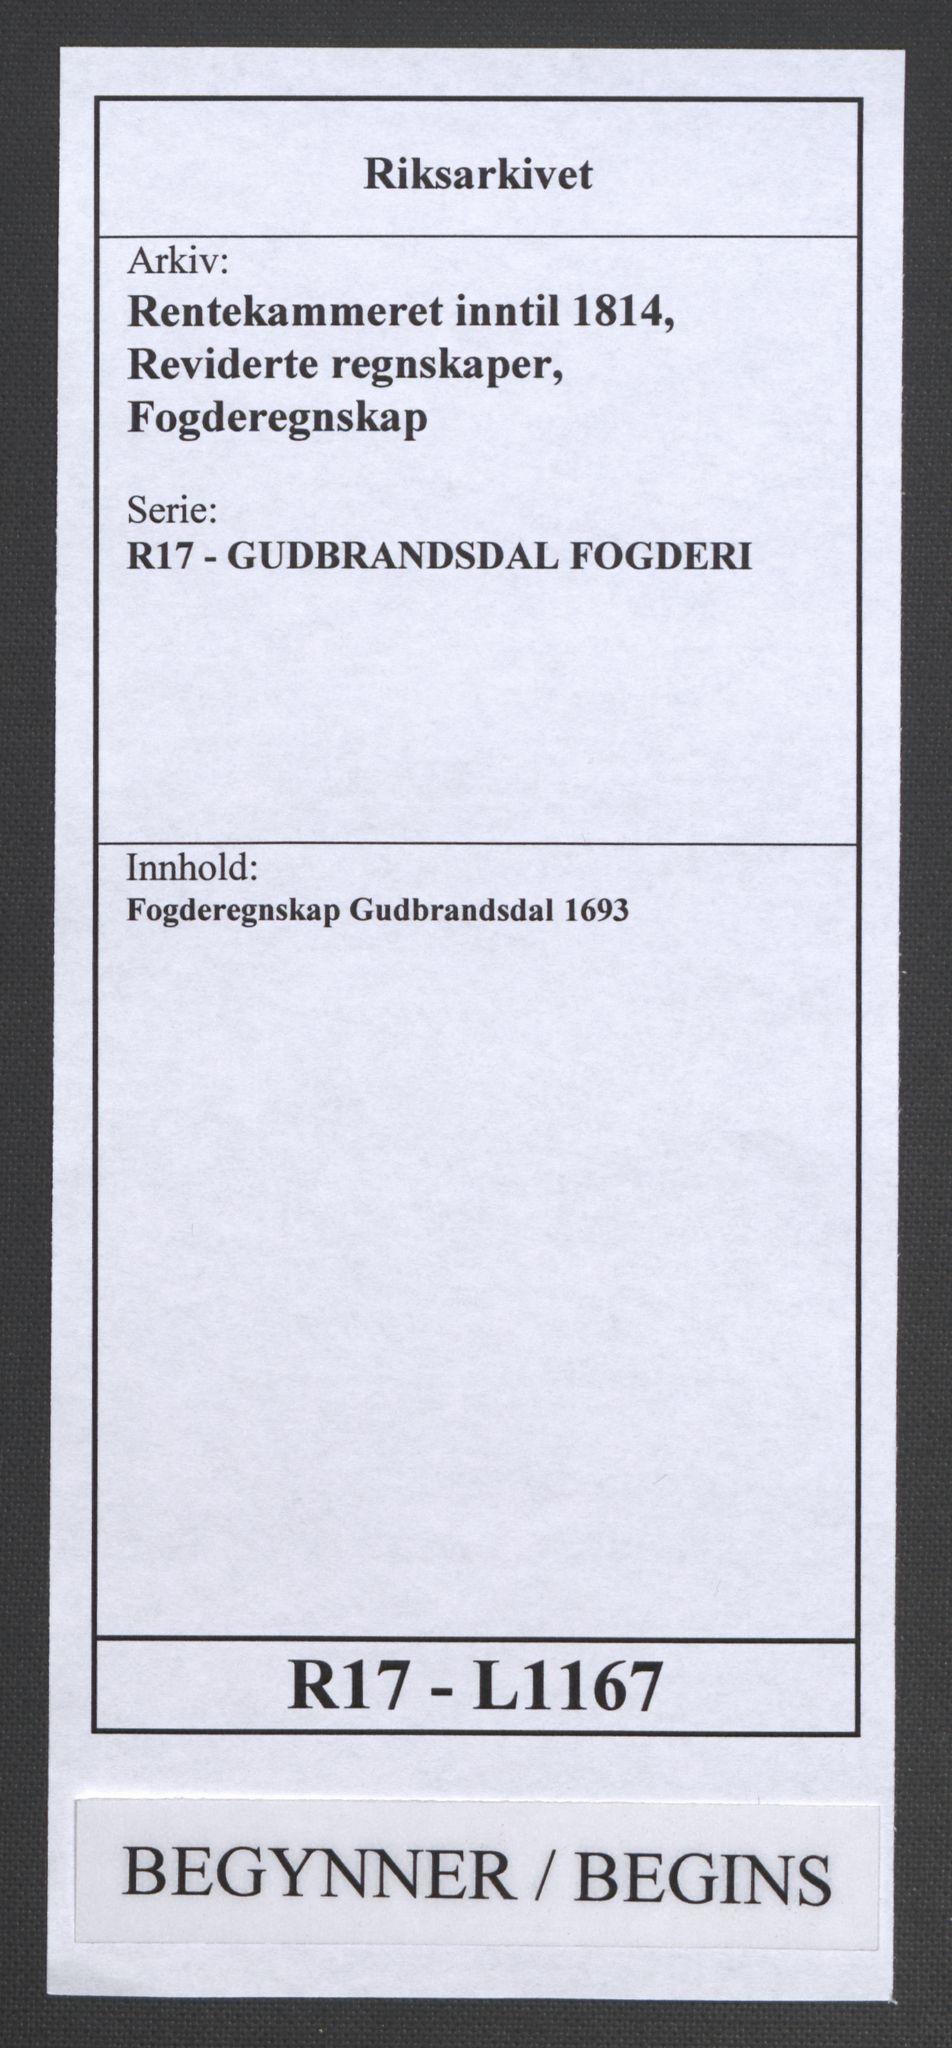 RA, Rentekammeret inntil 1814, Reviderte regnskaper, Fogderegnskap, R17/L1167: Fogderegnskap Gudbrandsdal, 1693, s. 1